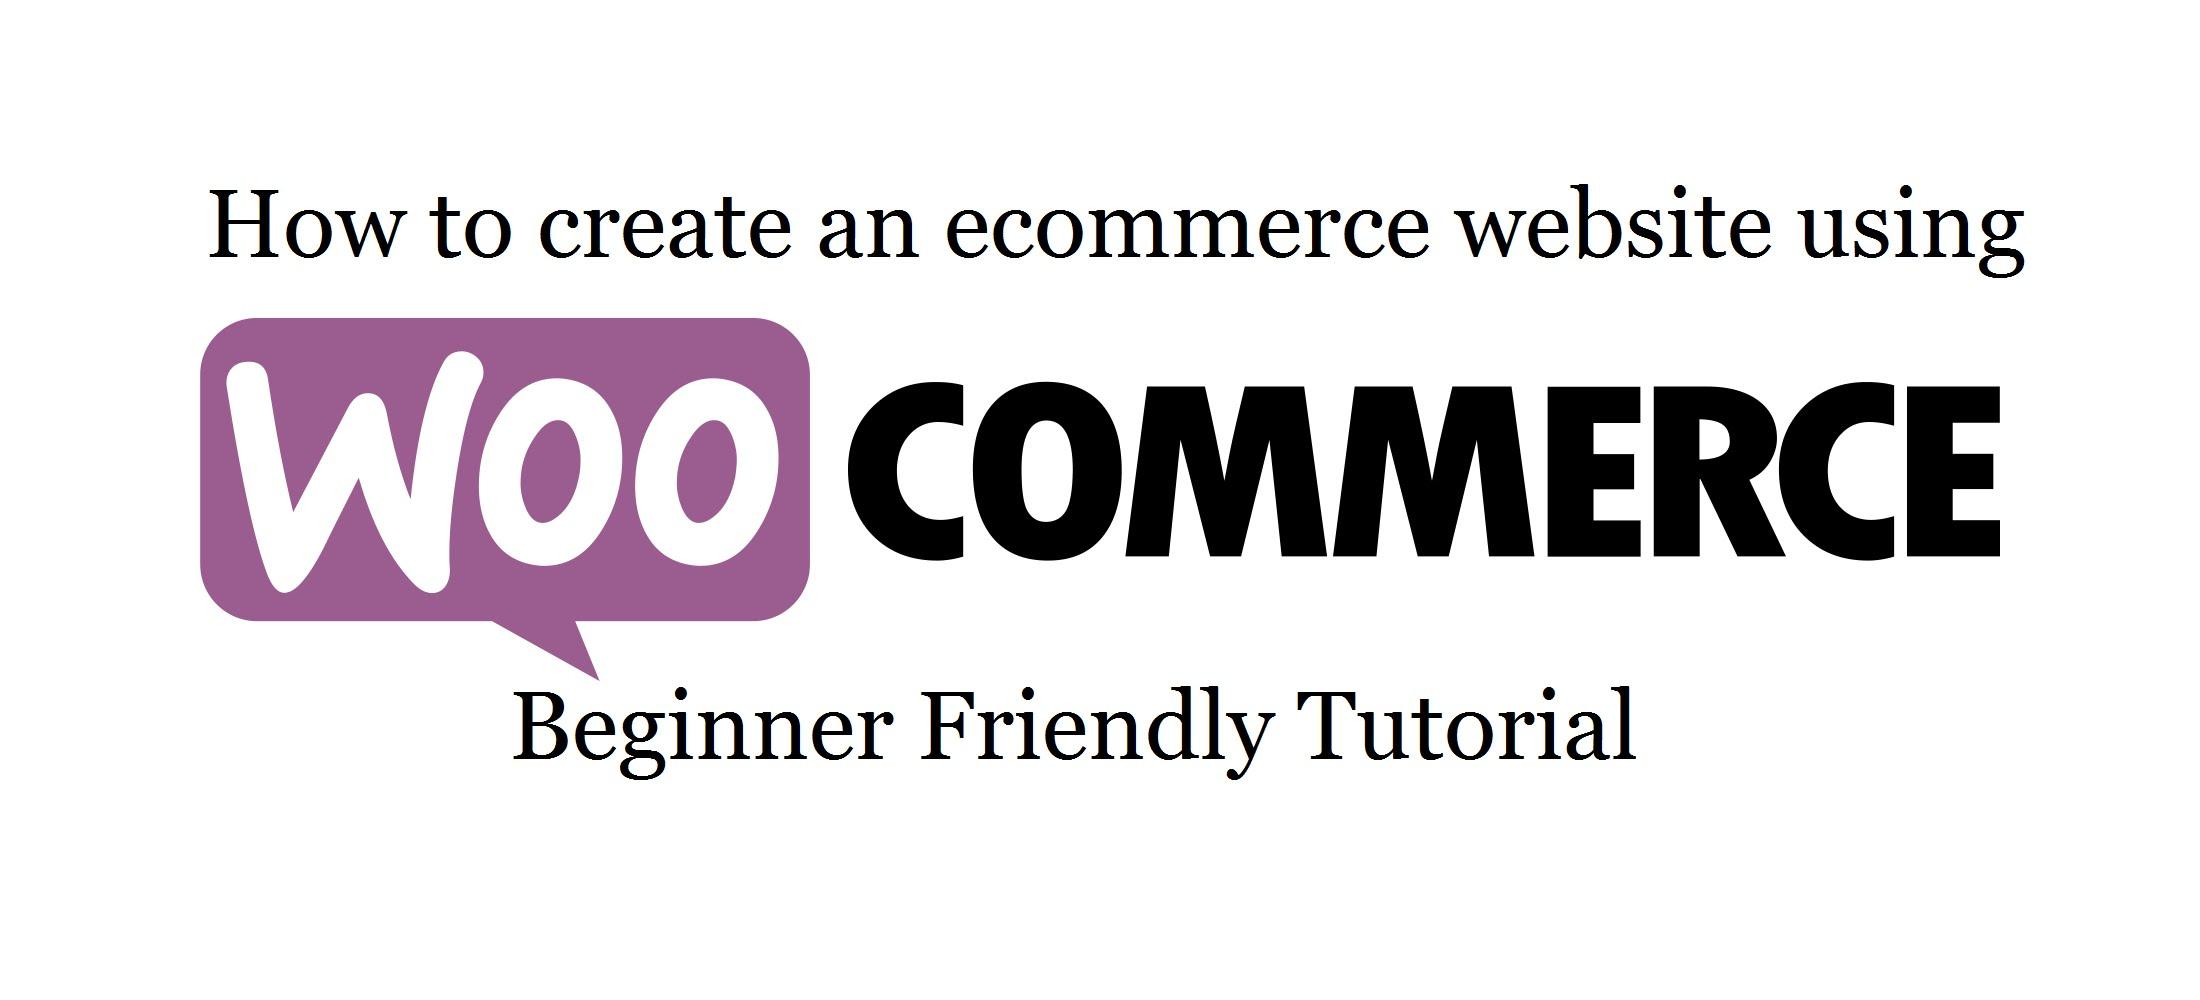 Create An Ecommerce Website In WordPress 2017 – Woocommerce Tutorial For Beginners